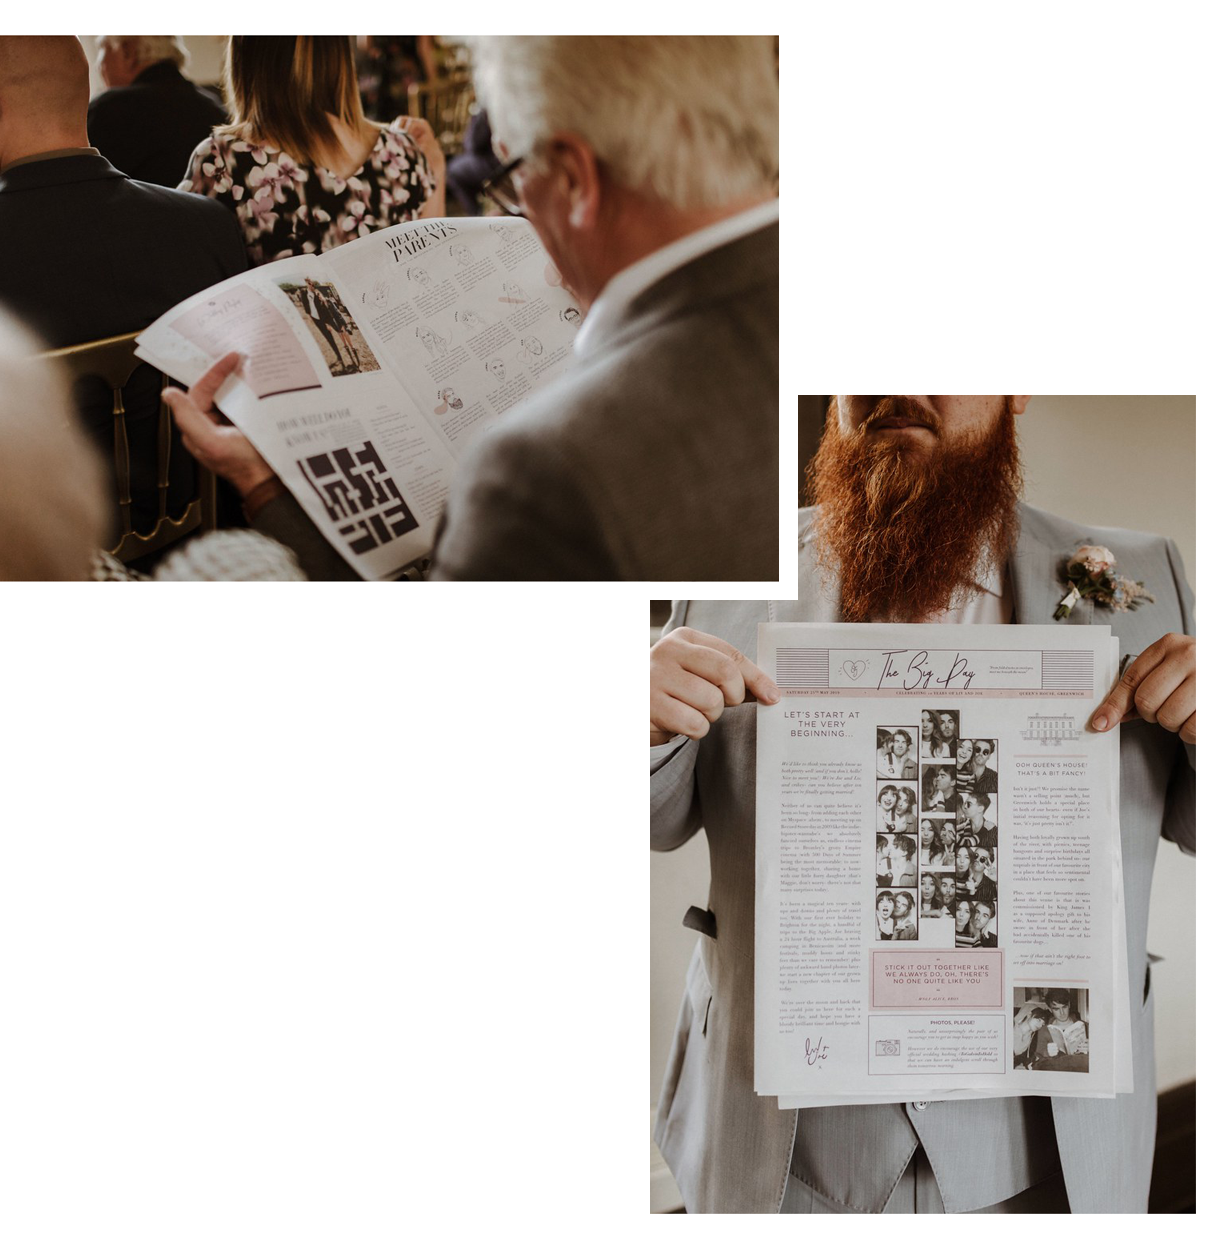 Liv Purvis order of service newspaper printed by Newspaper Club